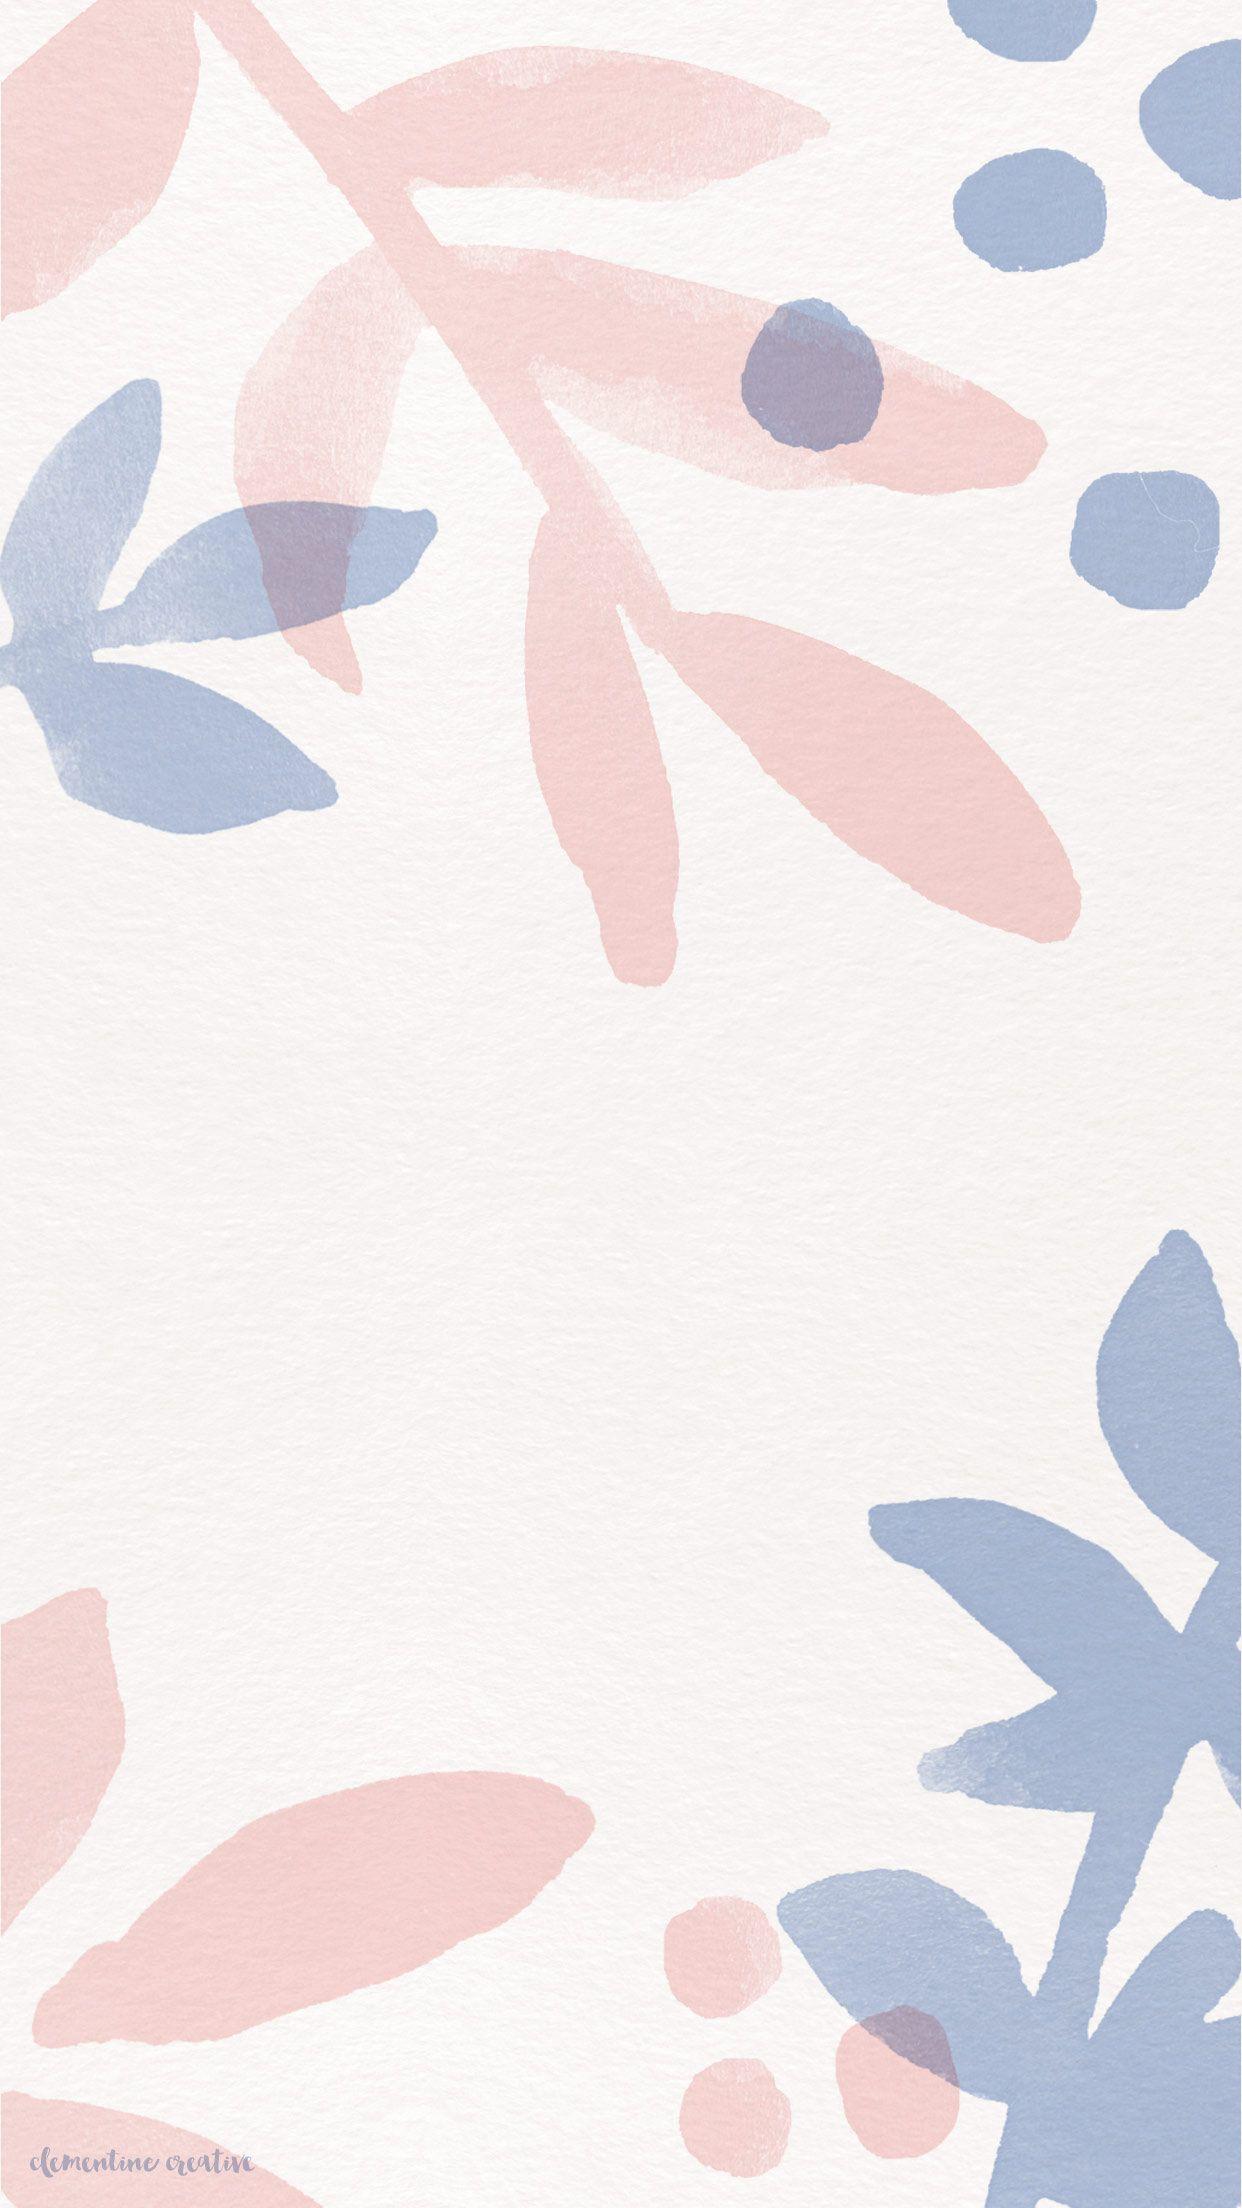 Blush pink lilac lavender watercolour texture iphone